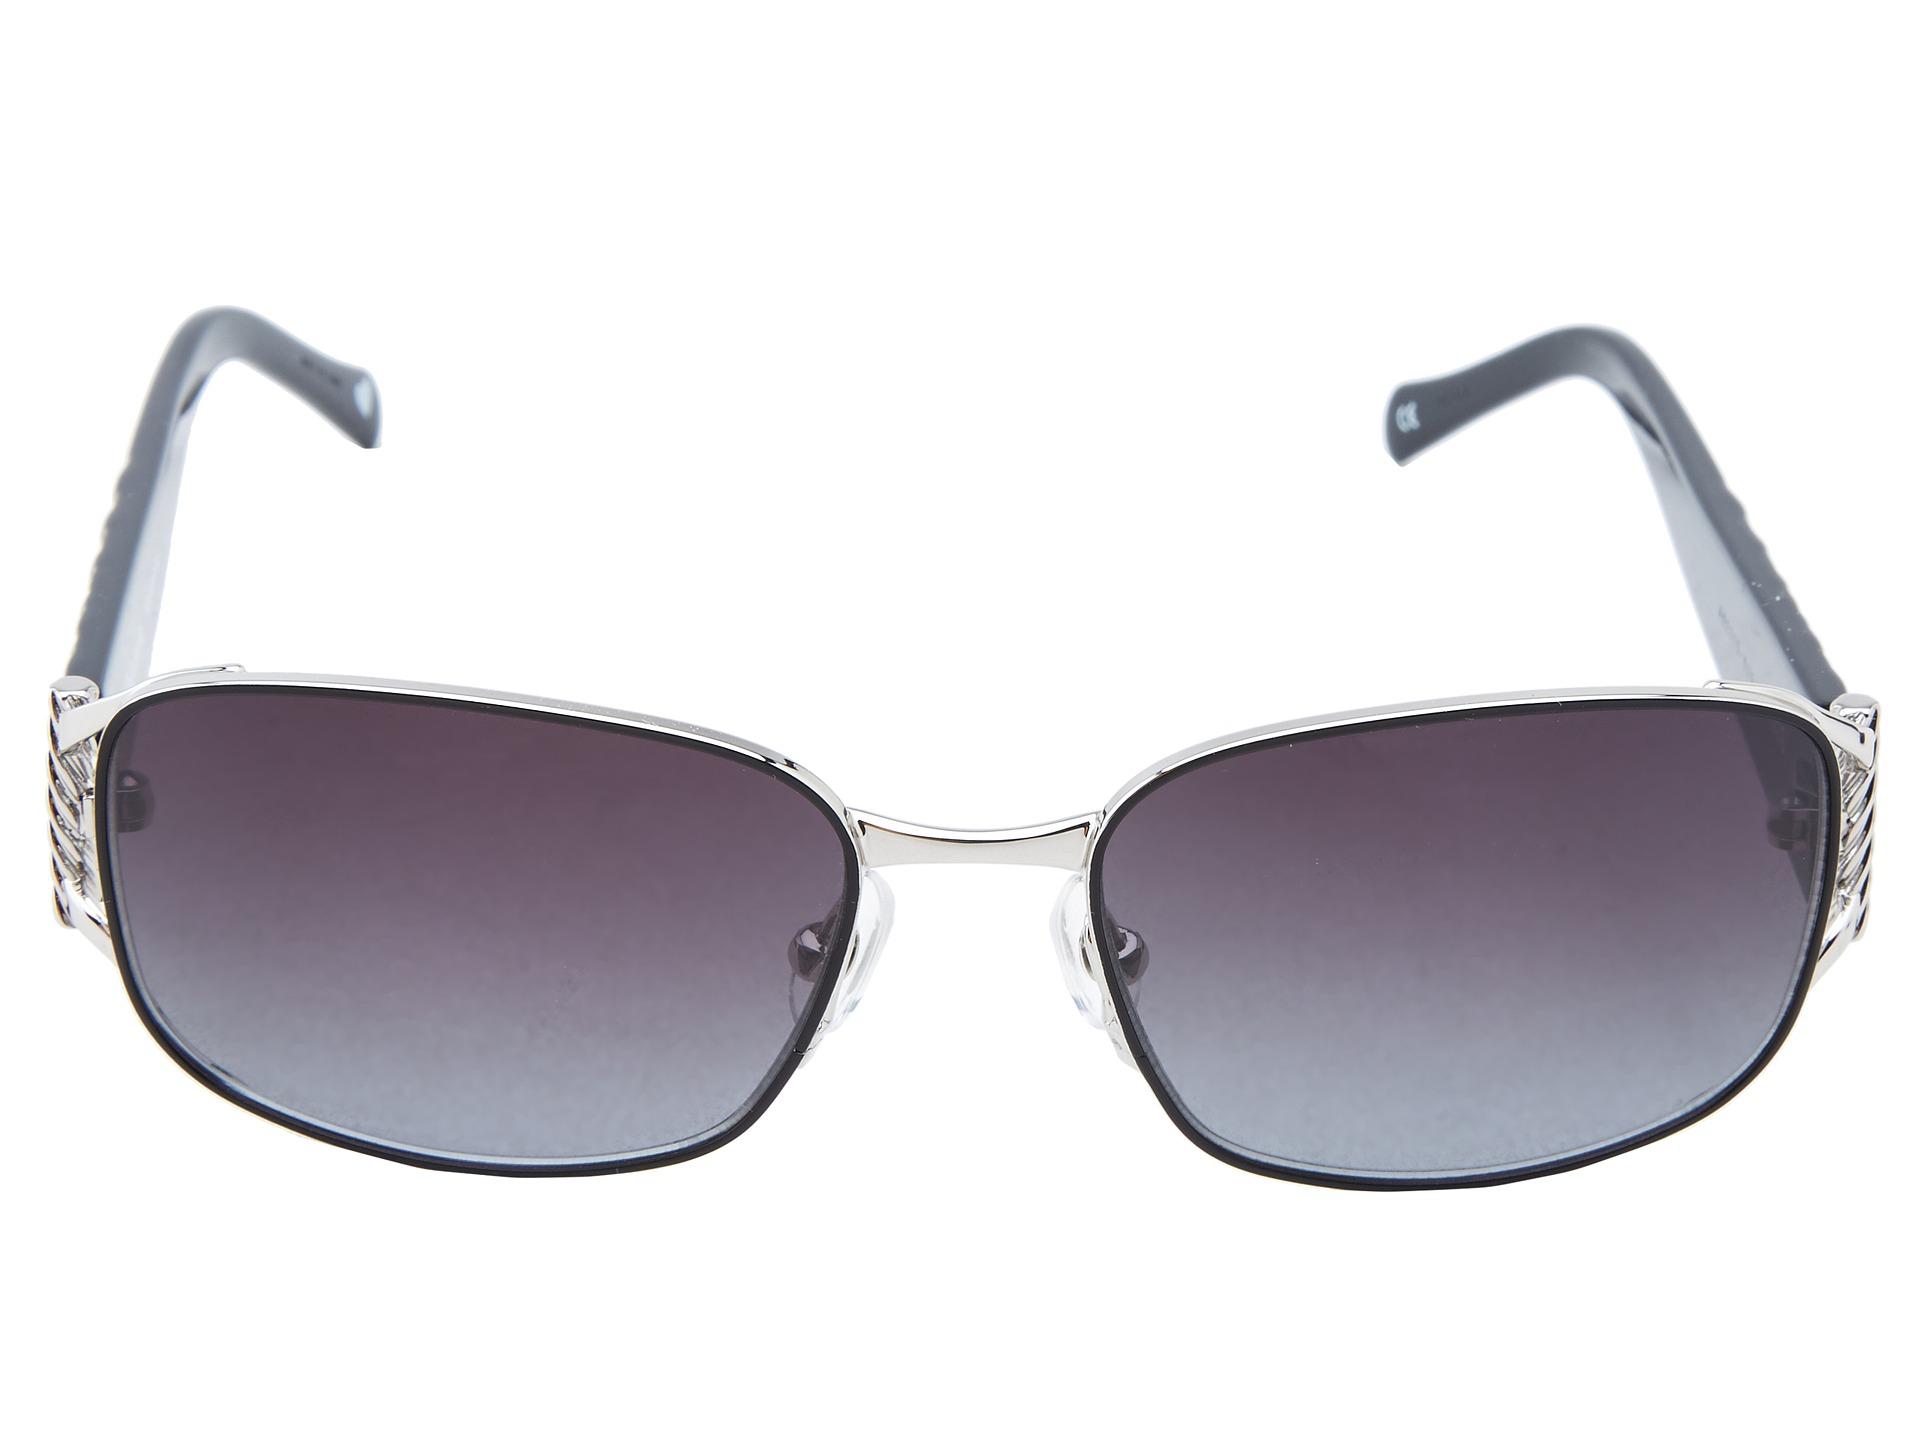 brighton sunglasses black ban polarized